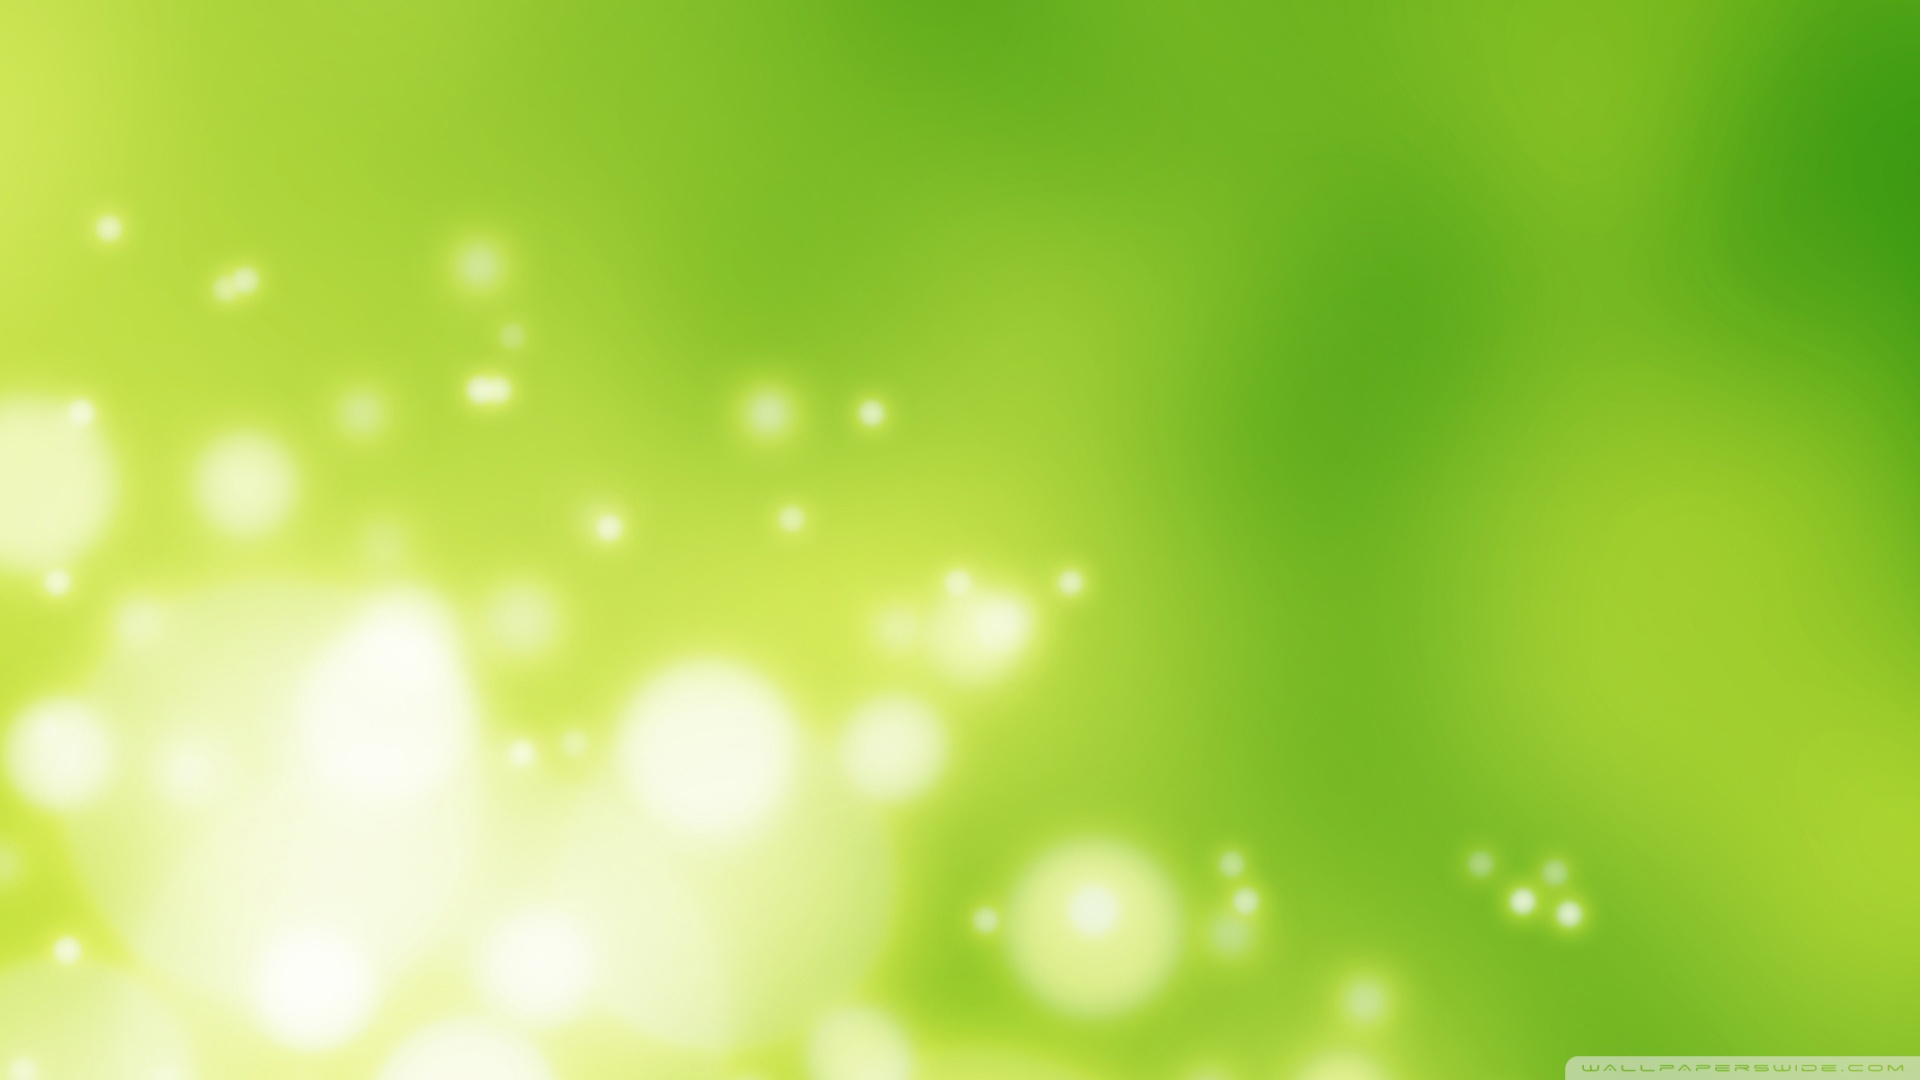 Light Green Wallpaper